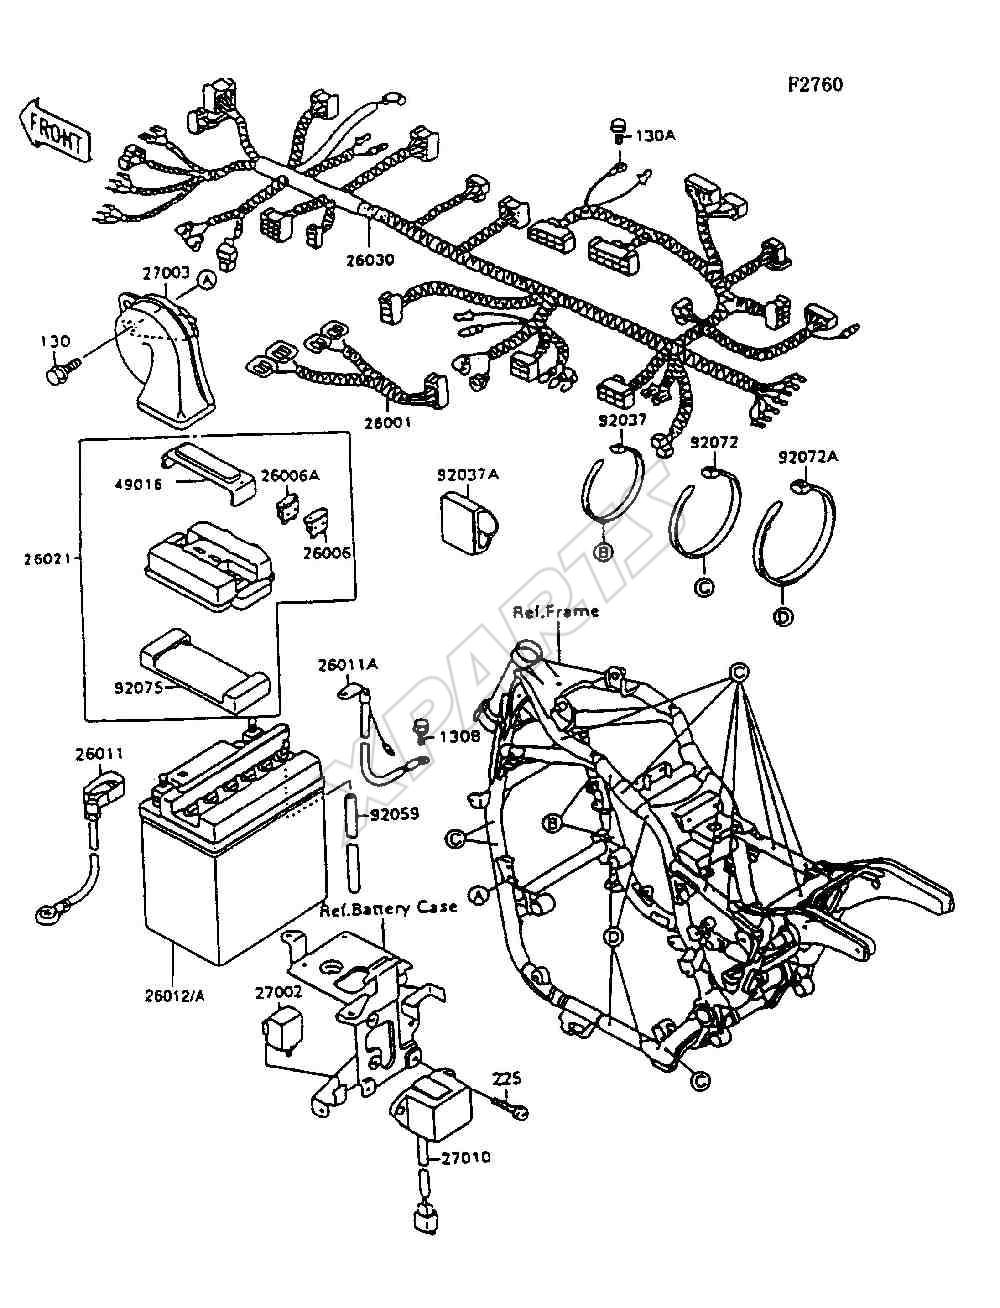 medium resolution of 1997 kawasaki vulcan 1500 wiring diagram schematics and wiring kawasaki vulcan custom 1997 vulcan 1500 l